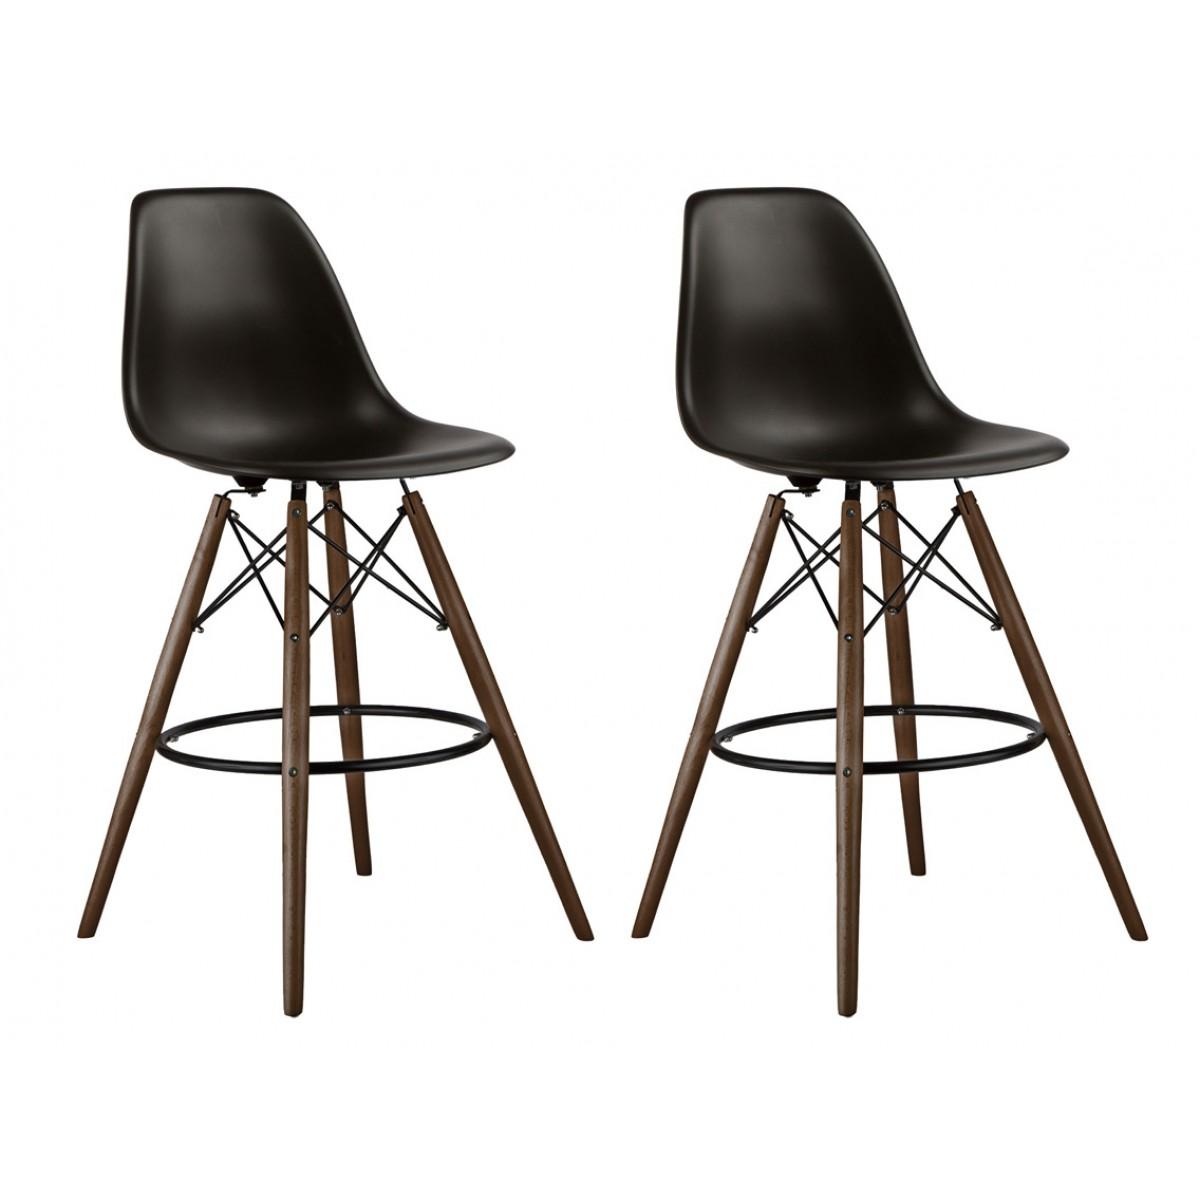 Strange Set Of 2 Black Dsw 26 Inch Counter Stool With Dark Walnut Wood Eiffel Legs Lamtechconsult Wood Chair Design Ideas Lamtechconsultcom